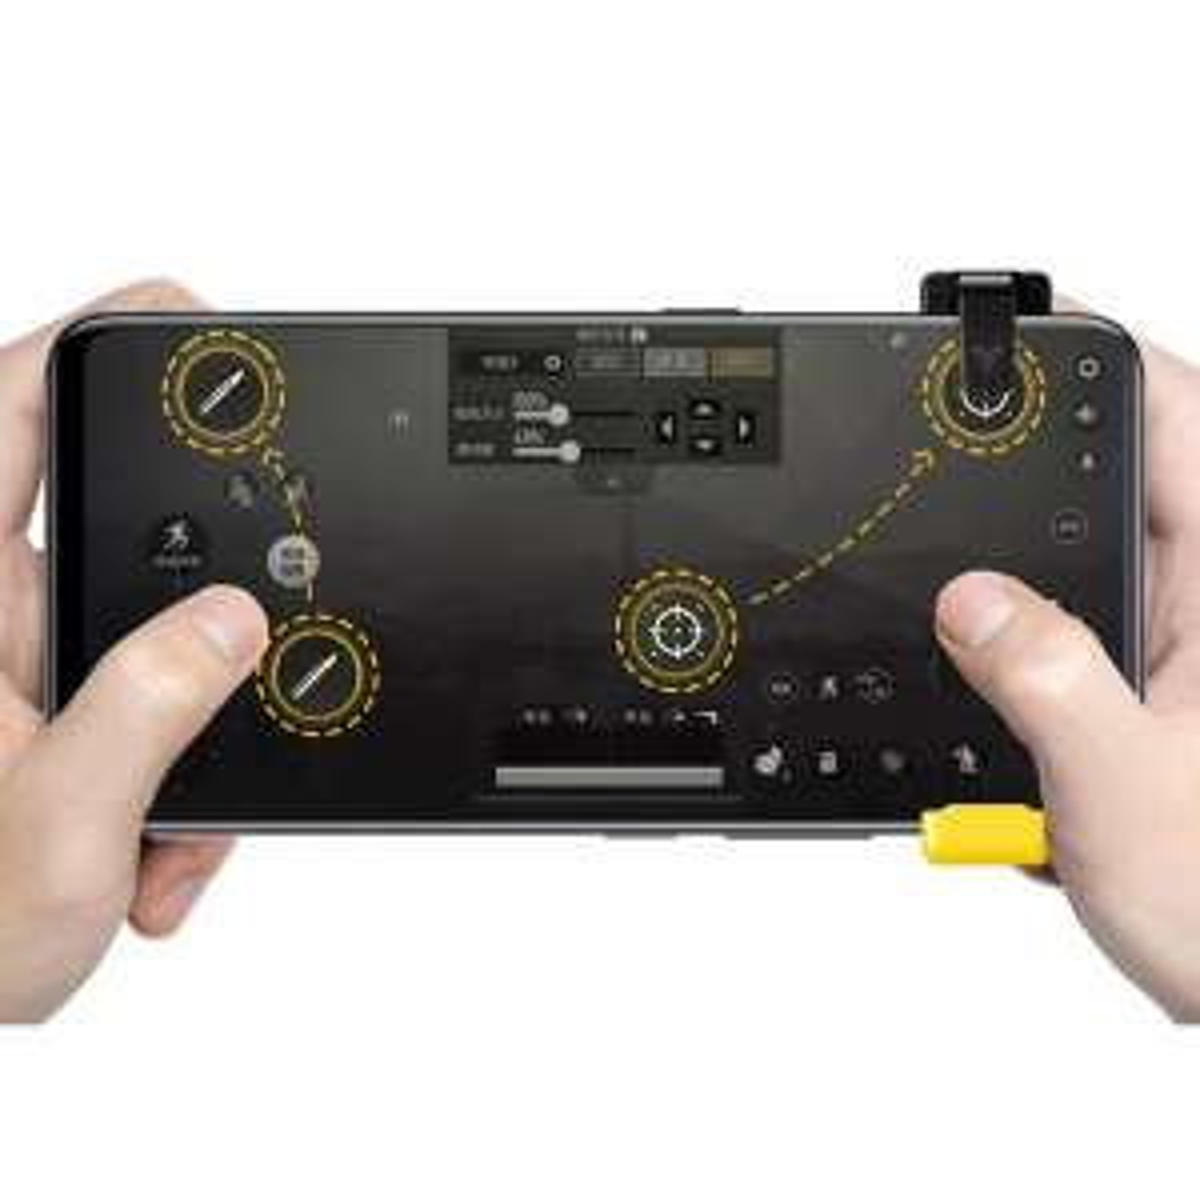 Flydigi  kontroler do mobilnej wersji PUBG - Android i Iphone